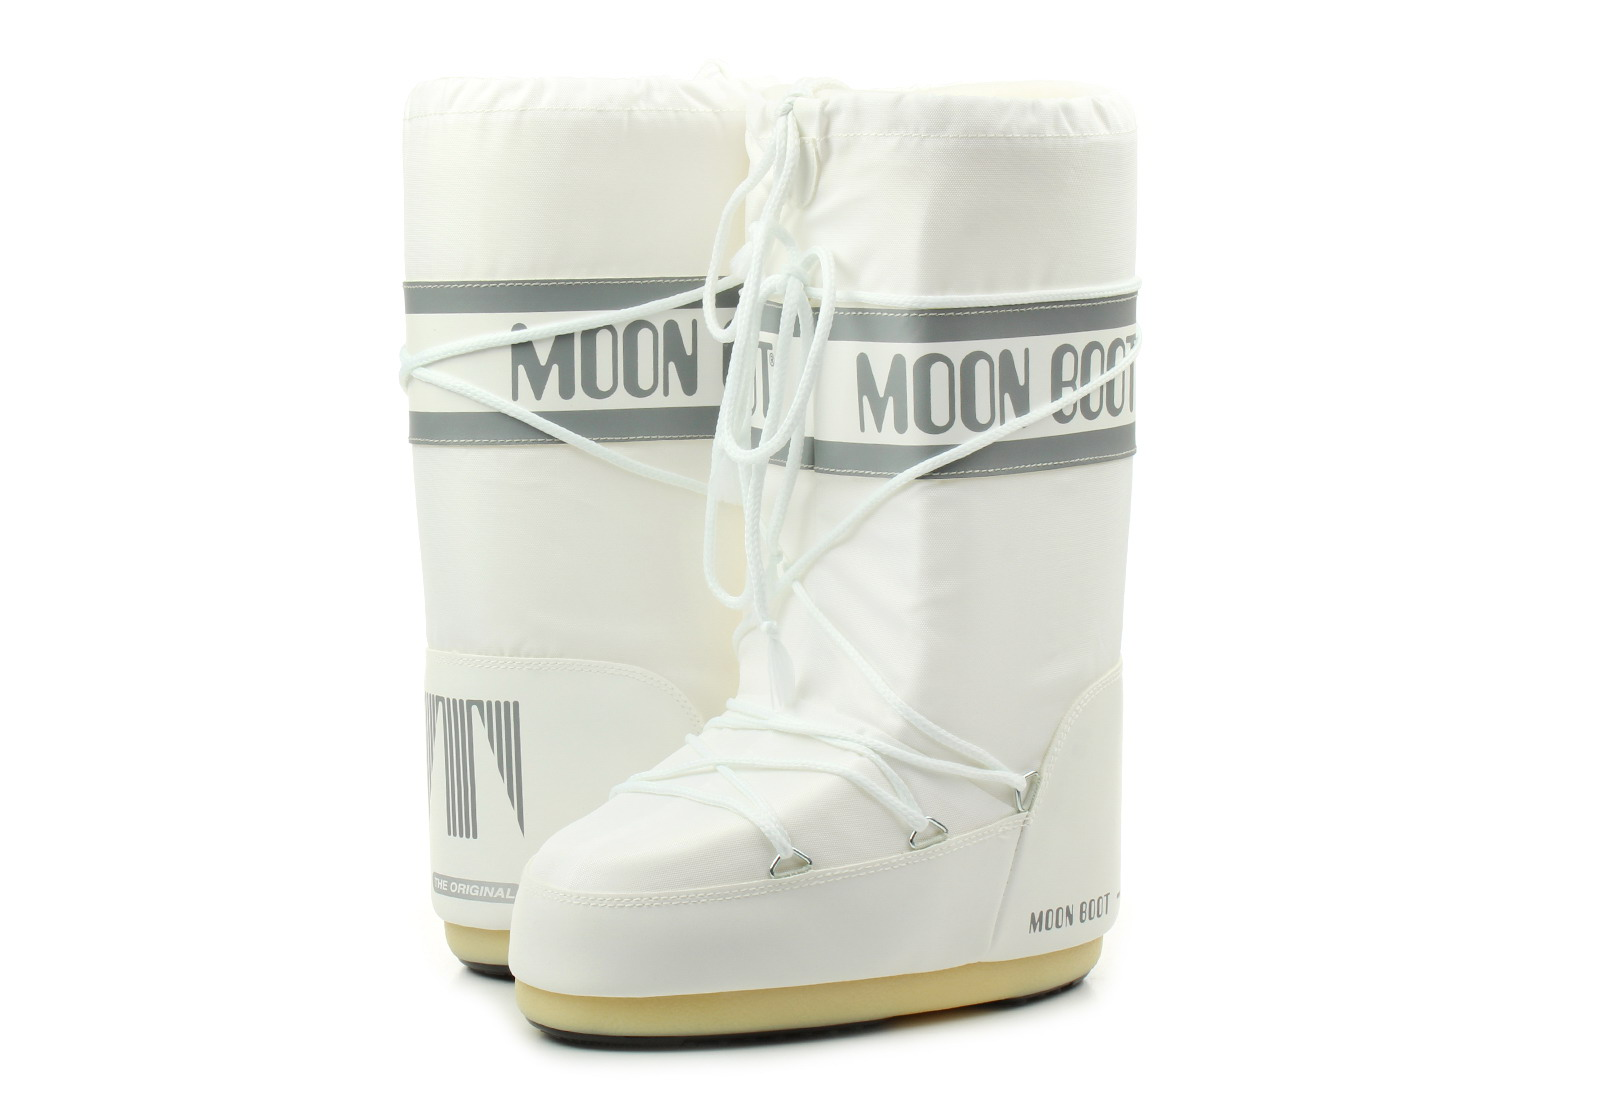 Moon Boot Vysoké Boty Moon Boot Nylon